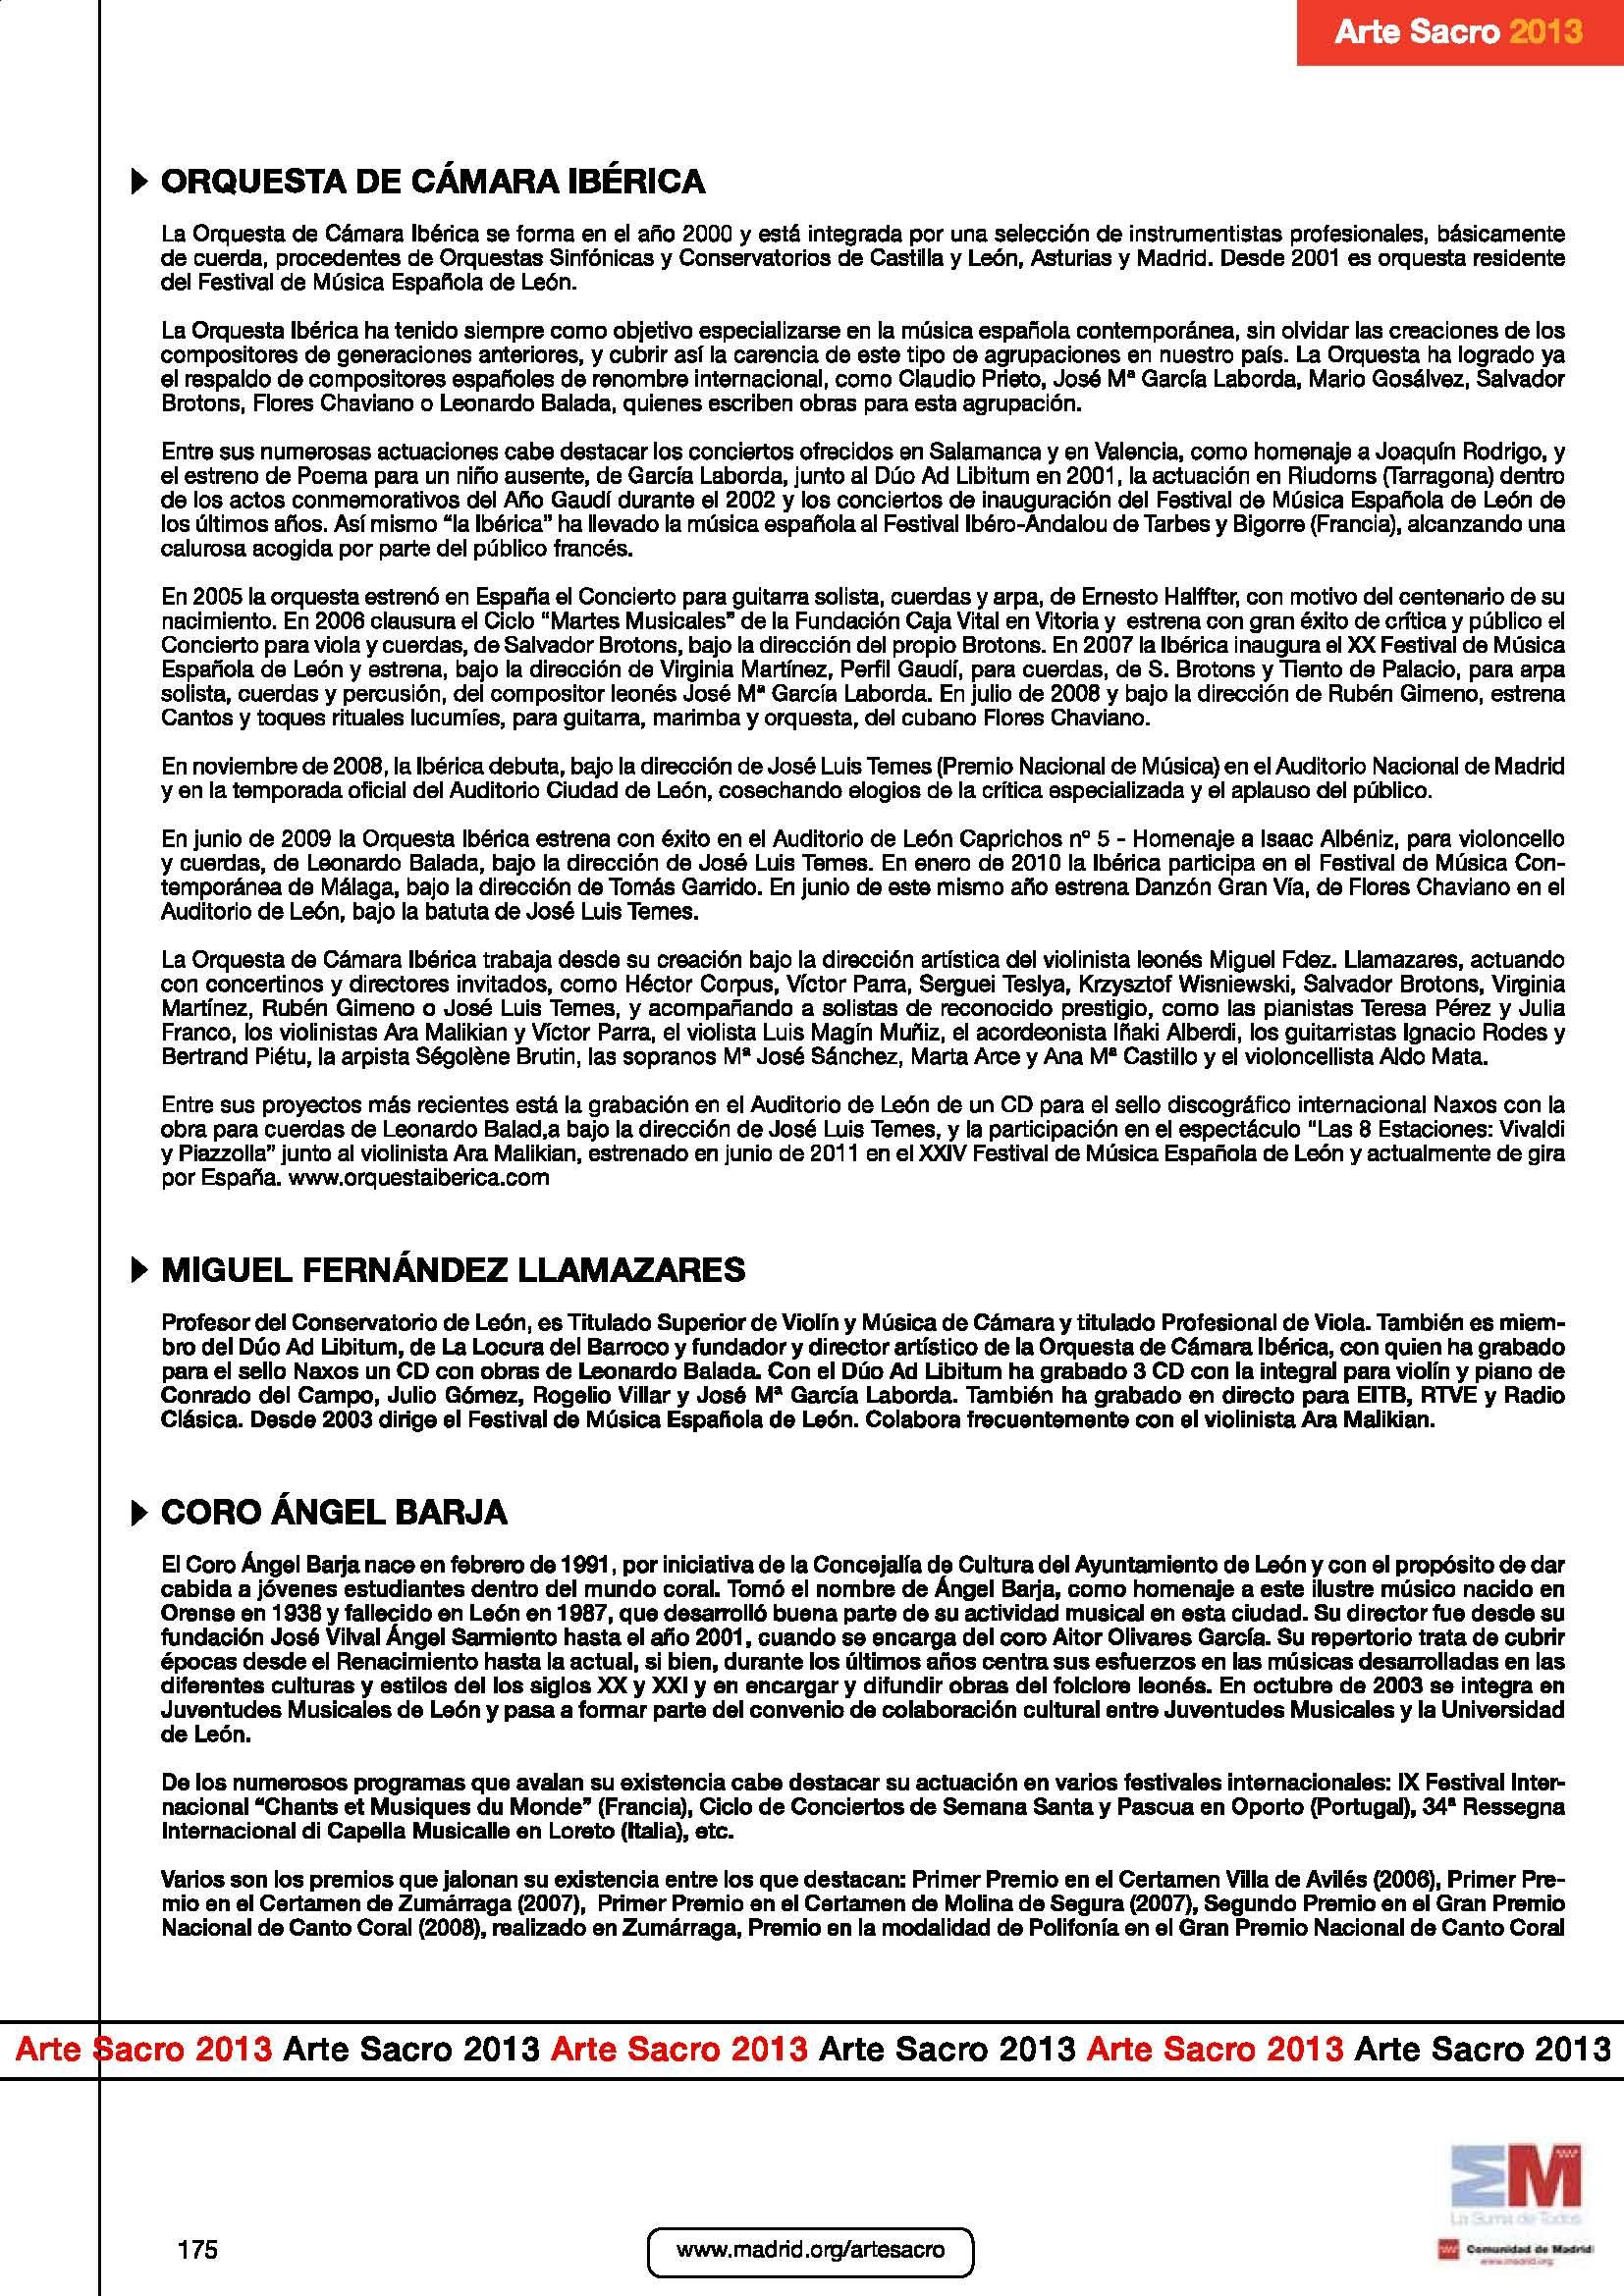 dossier_completo_Página_175